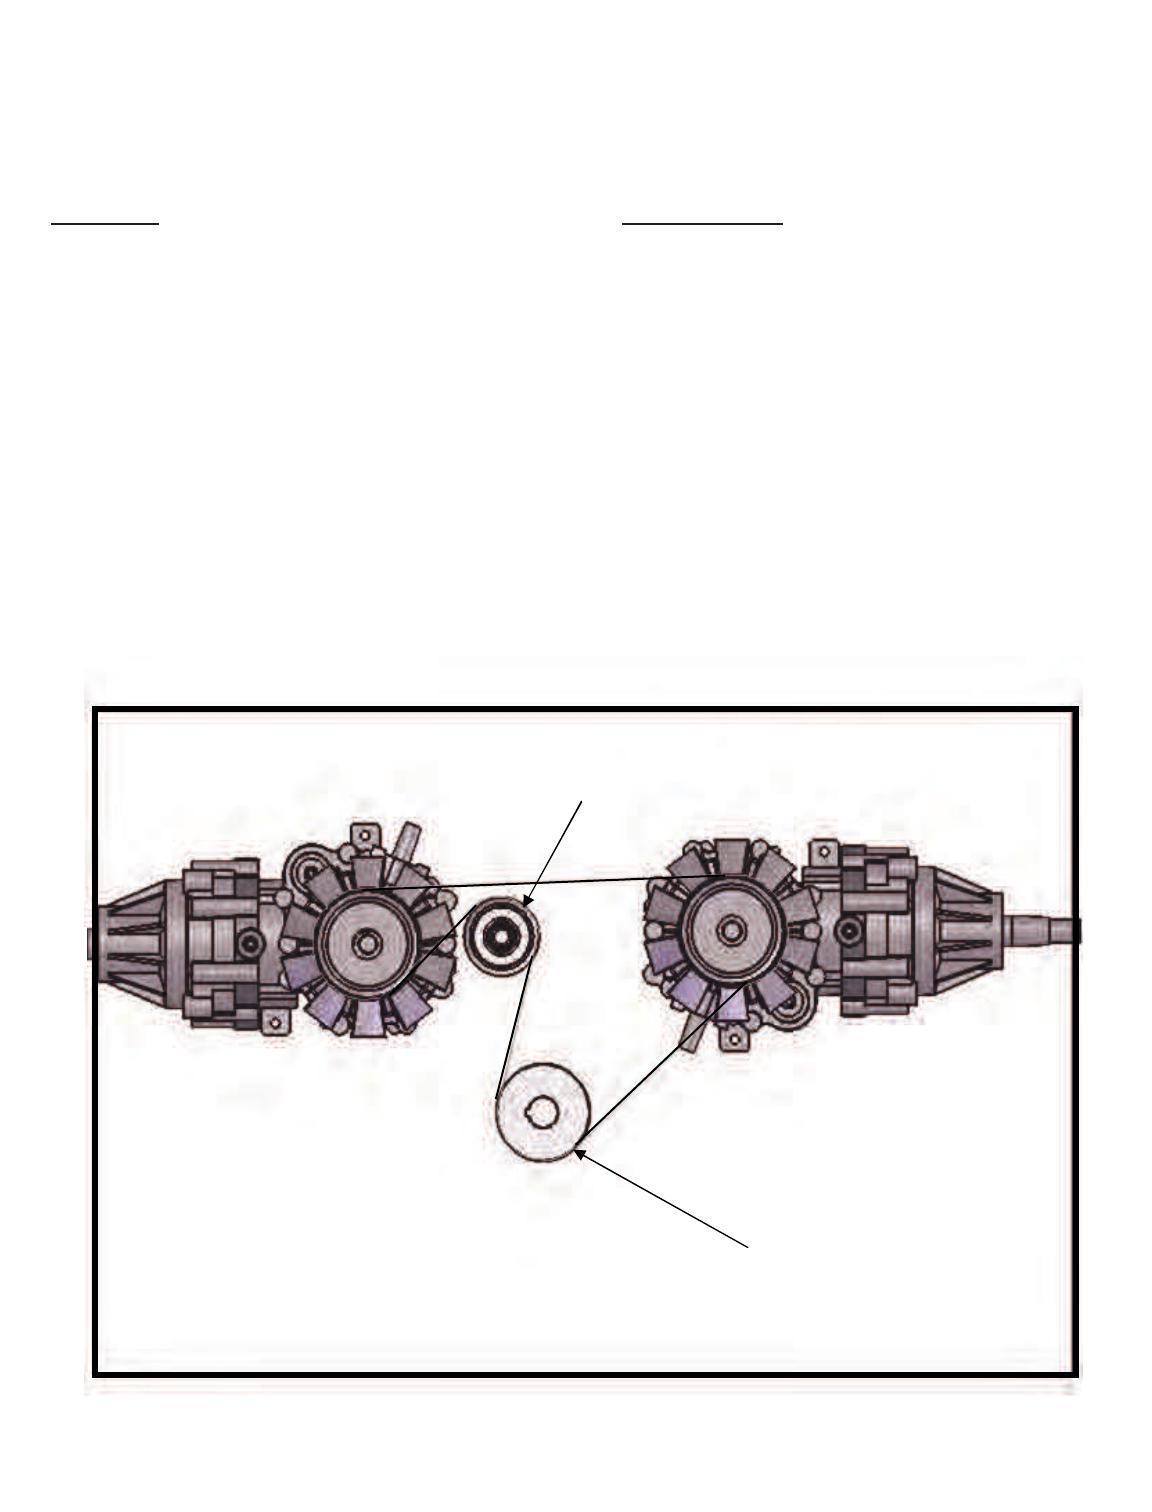 Swisher Wiring Diagram